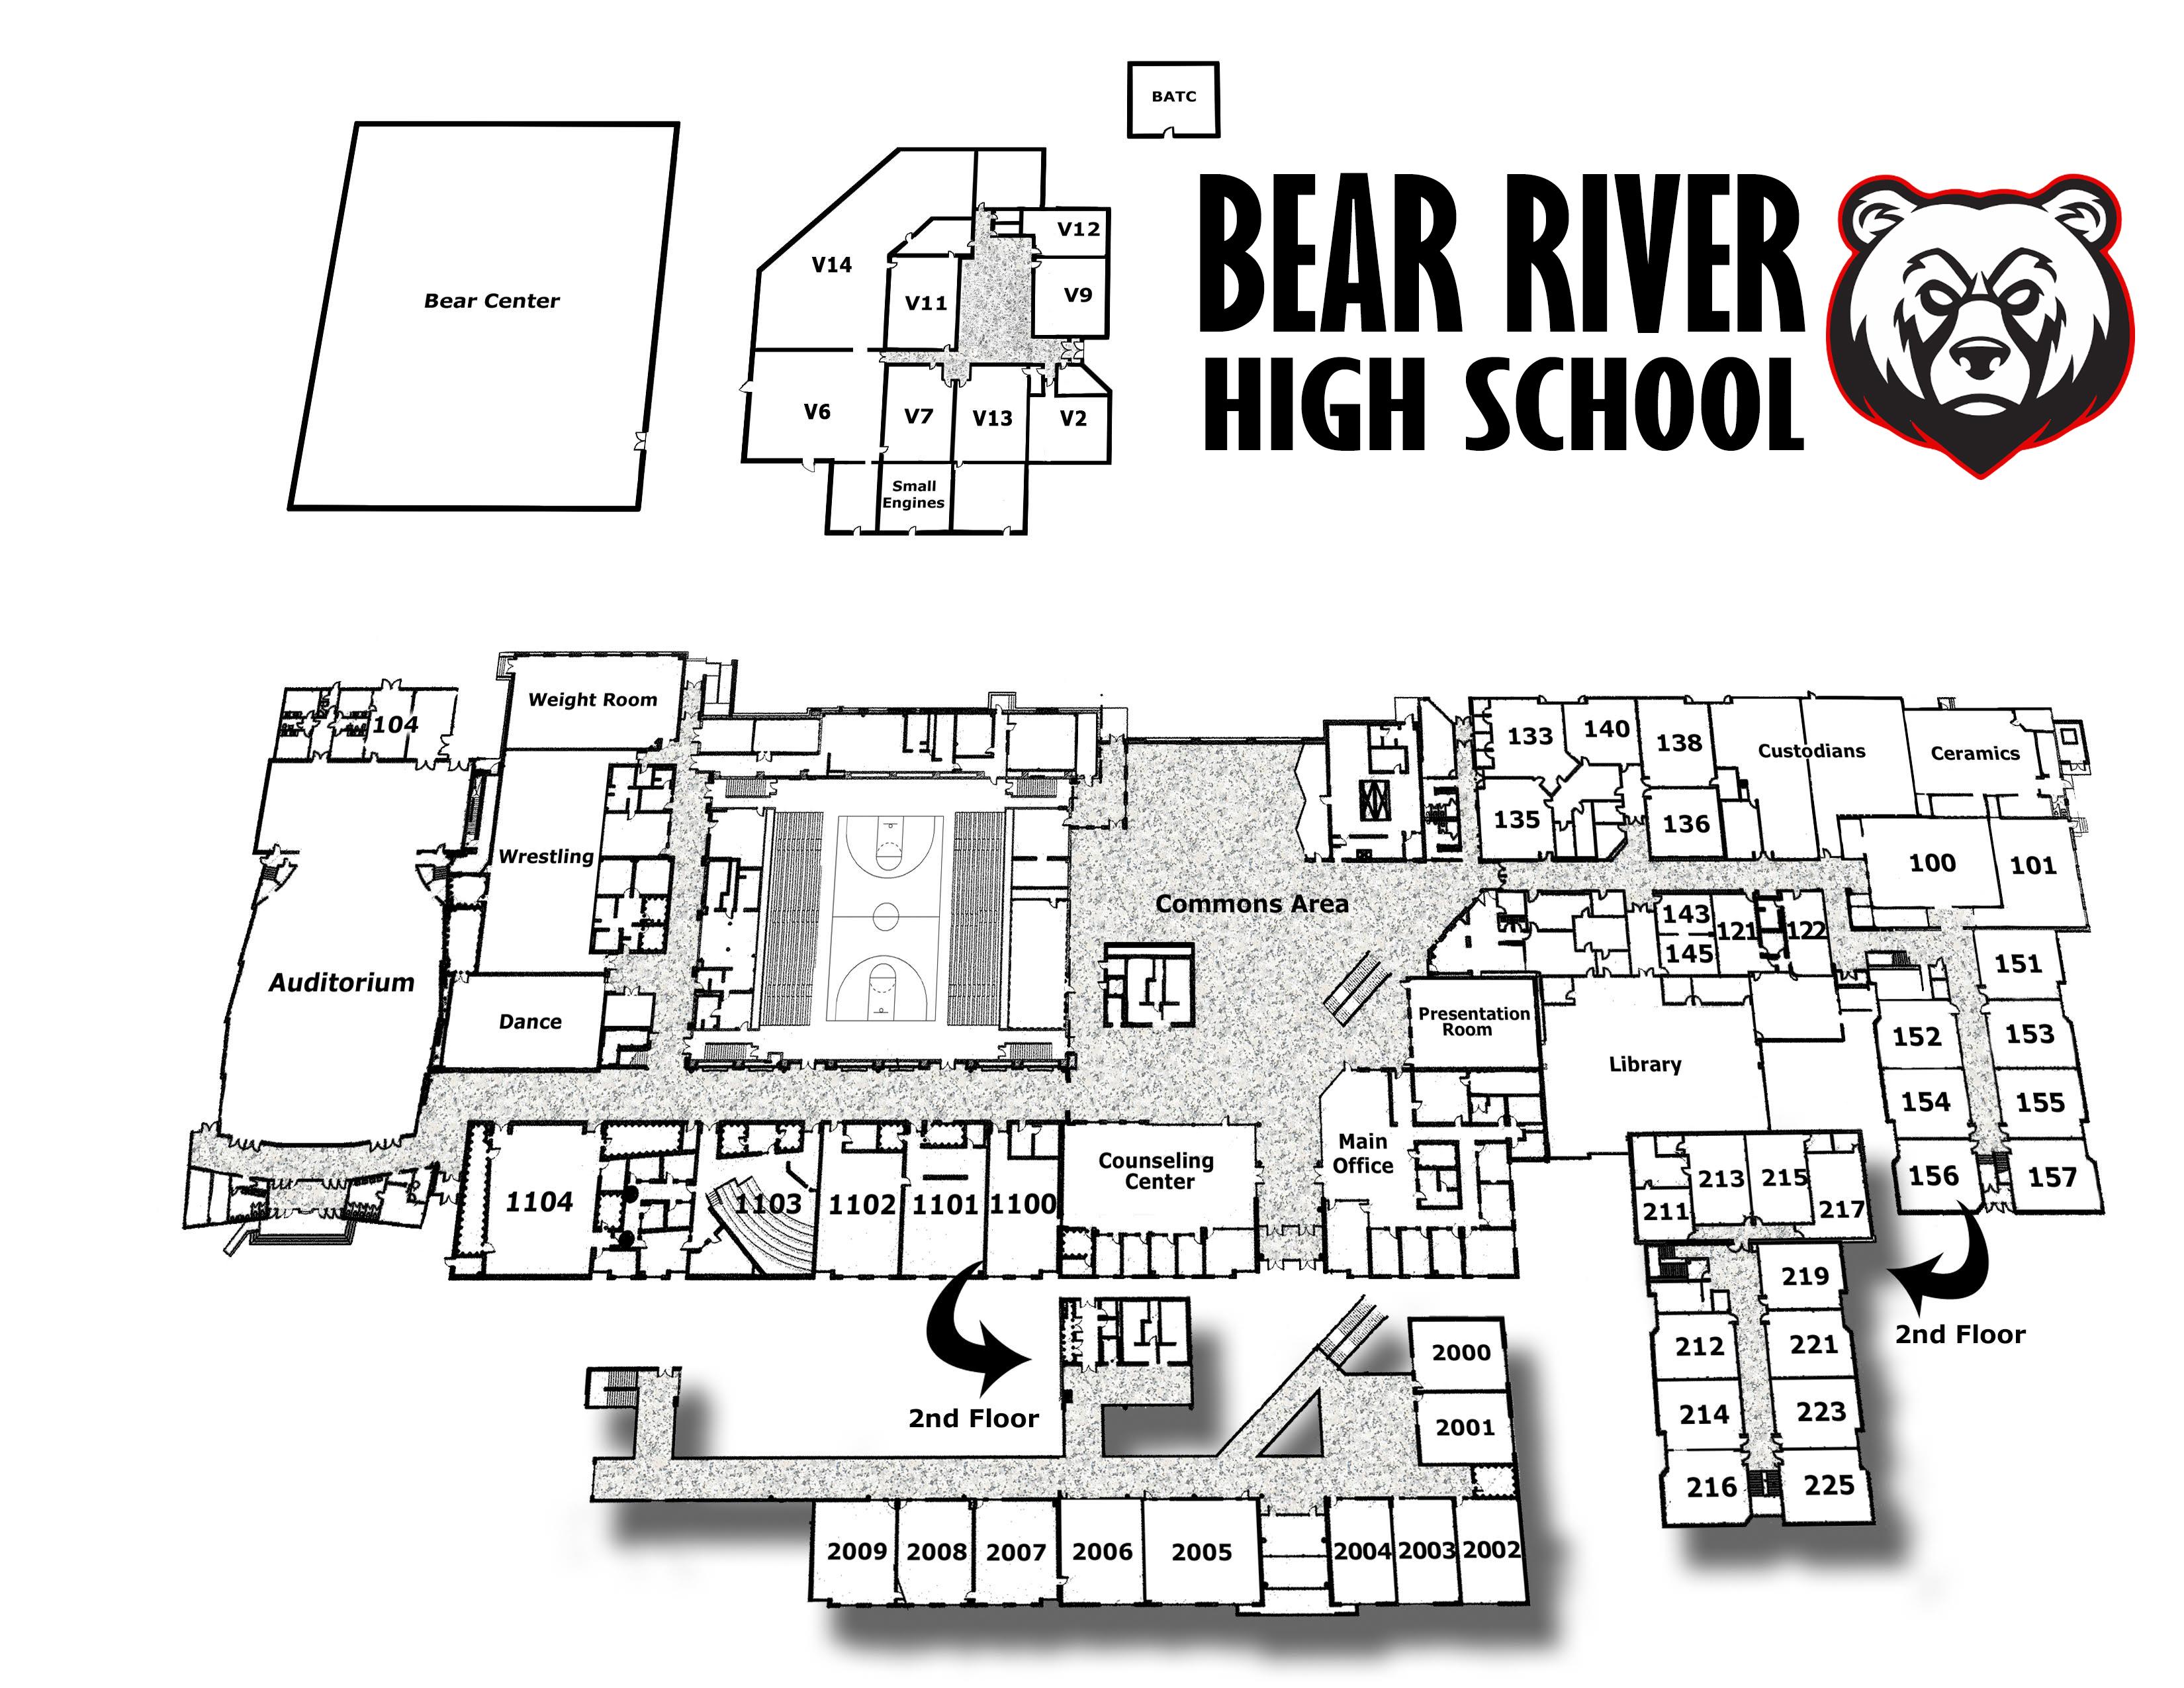 BRHS School map